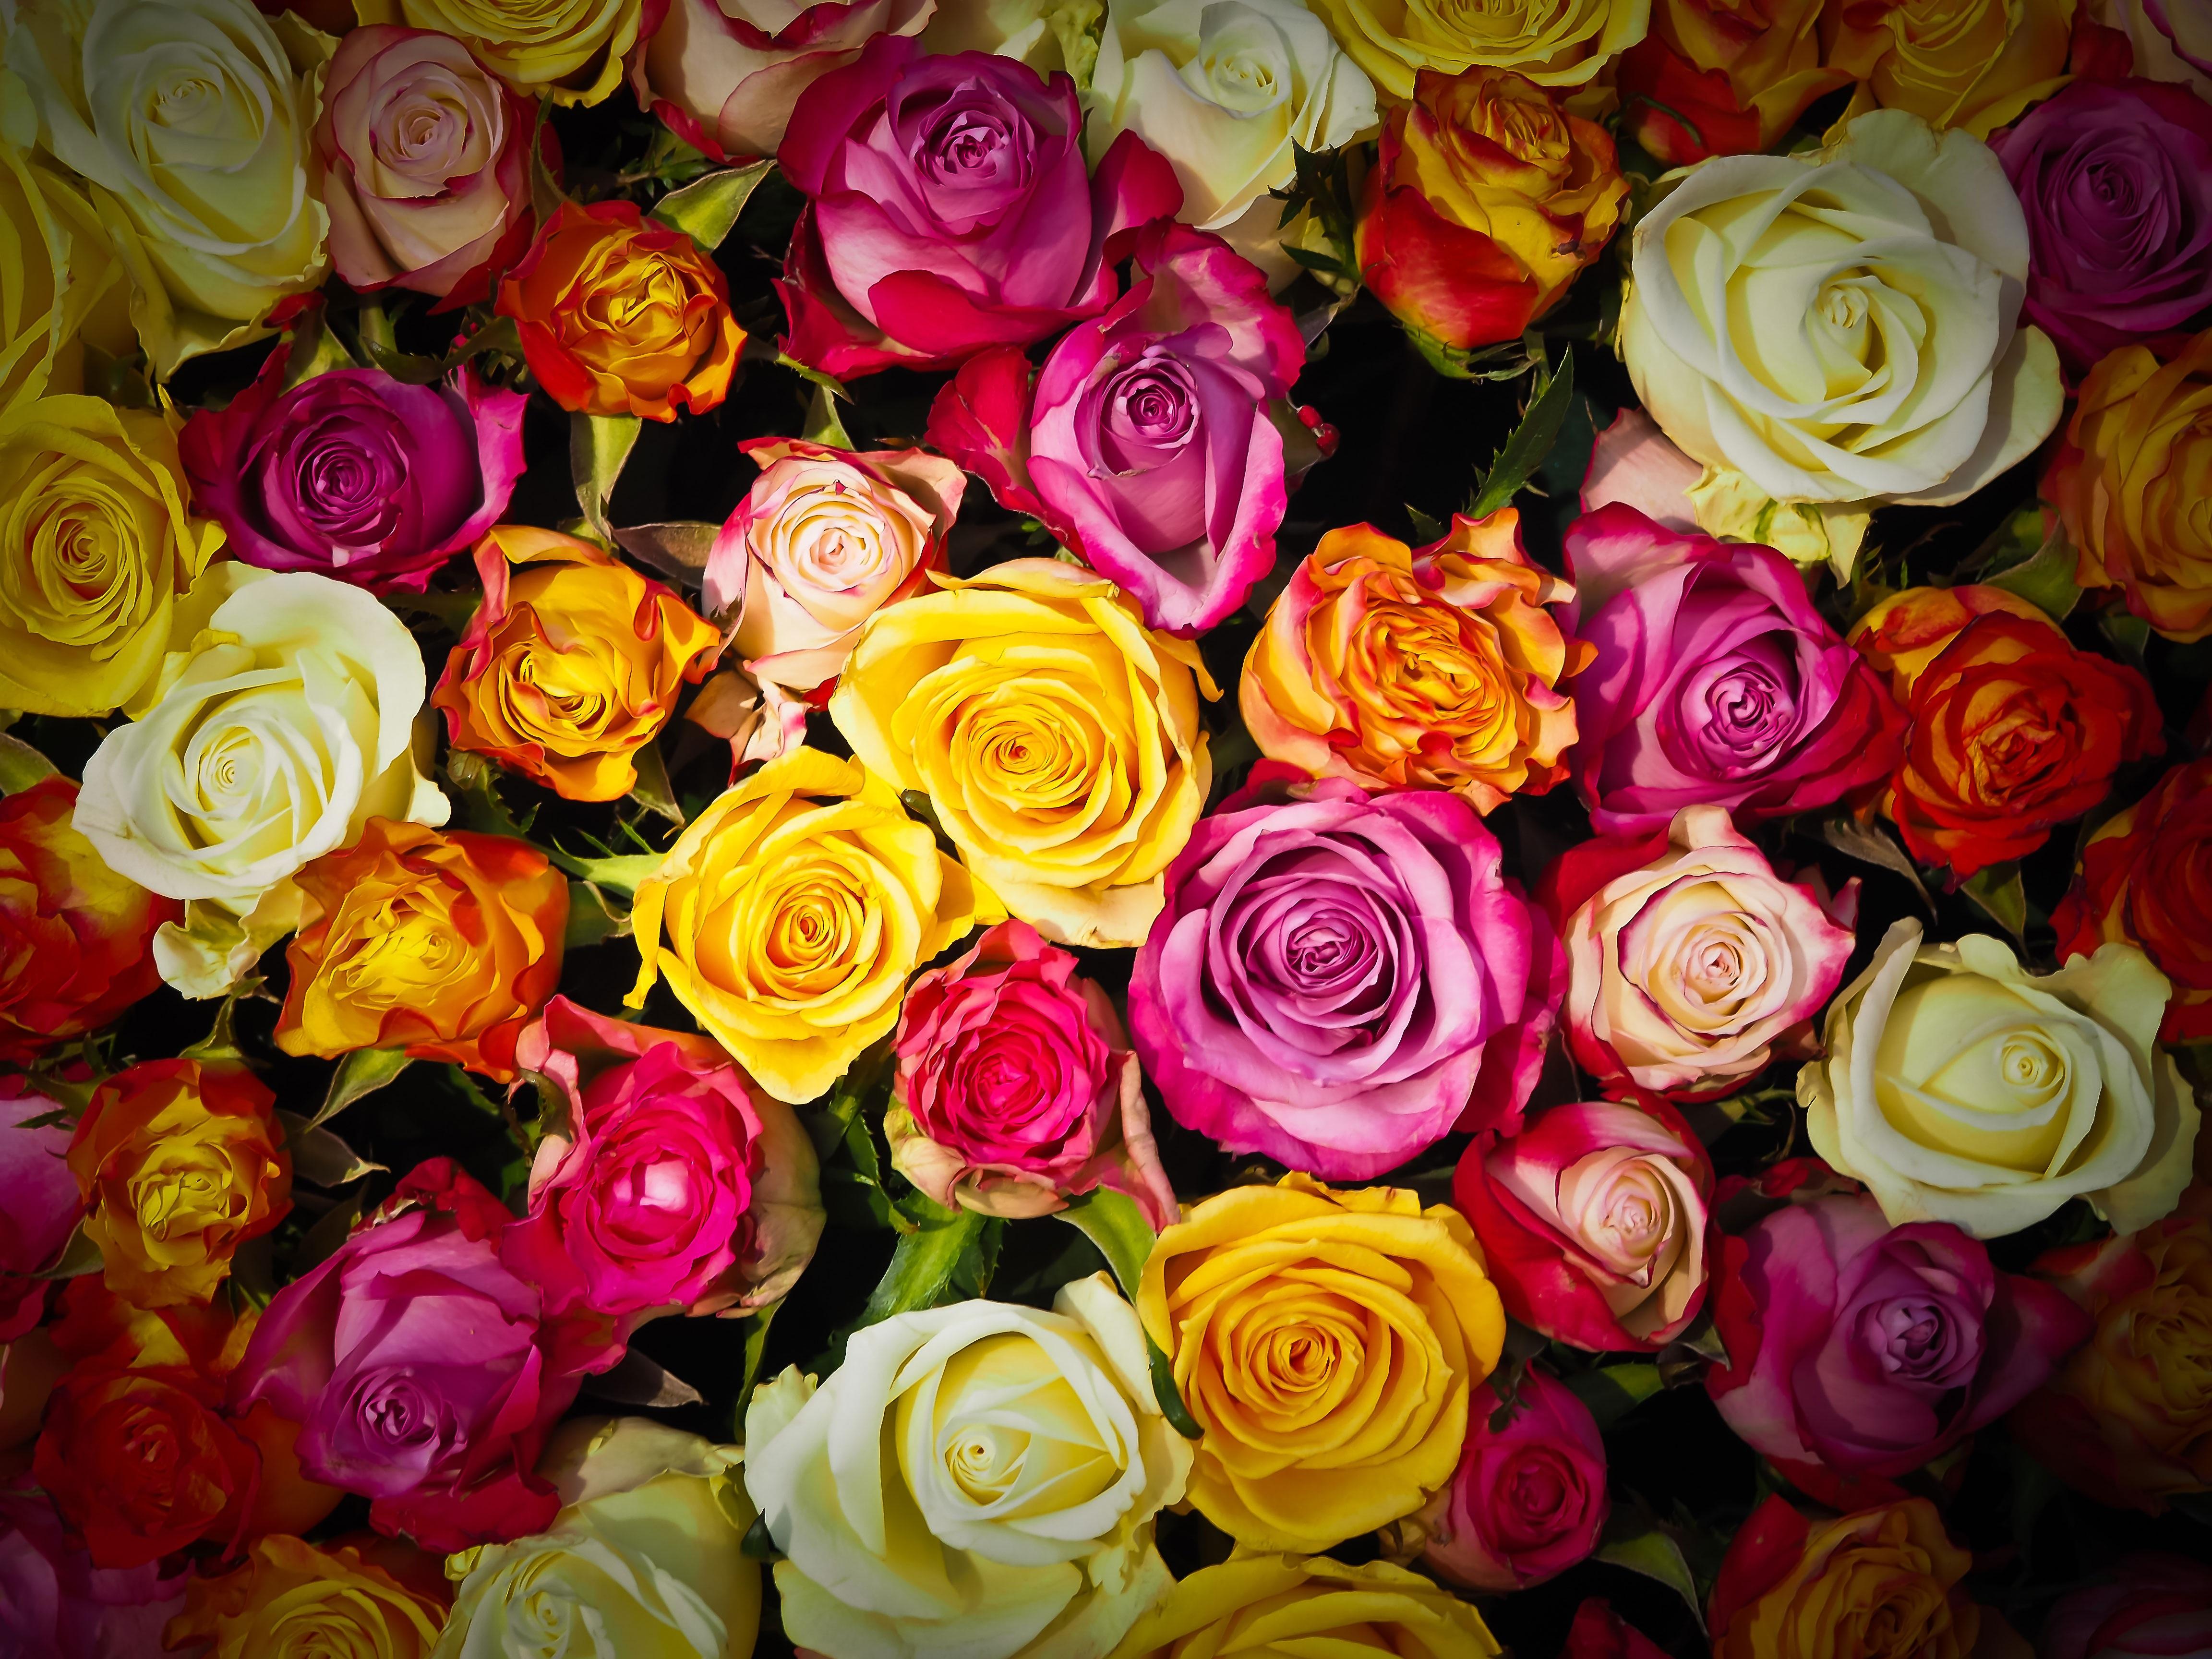 Super Banco de imagens : plantar, branco, flor, pétala, ramalhete  XX51